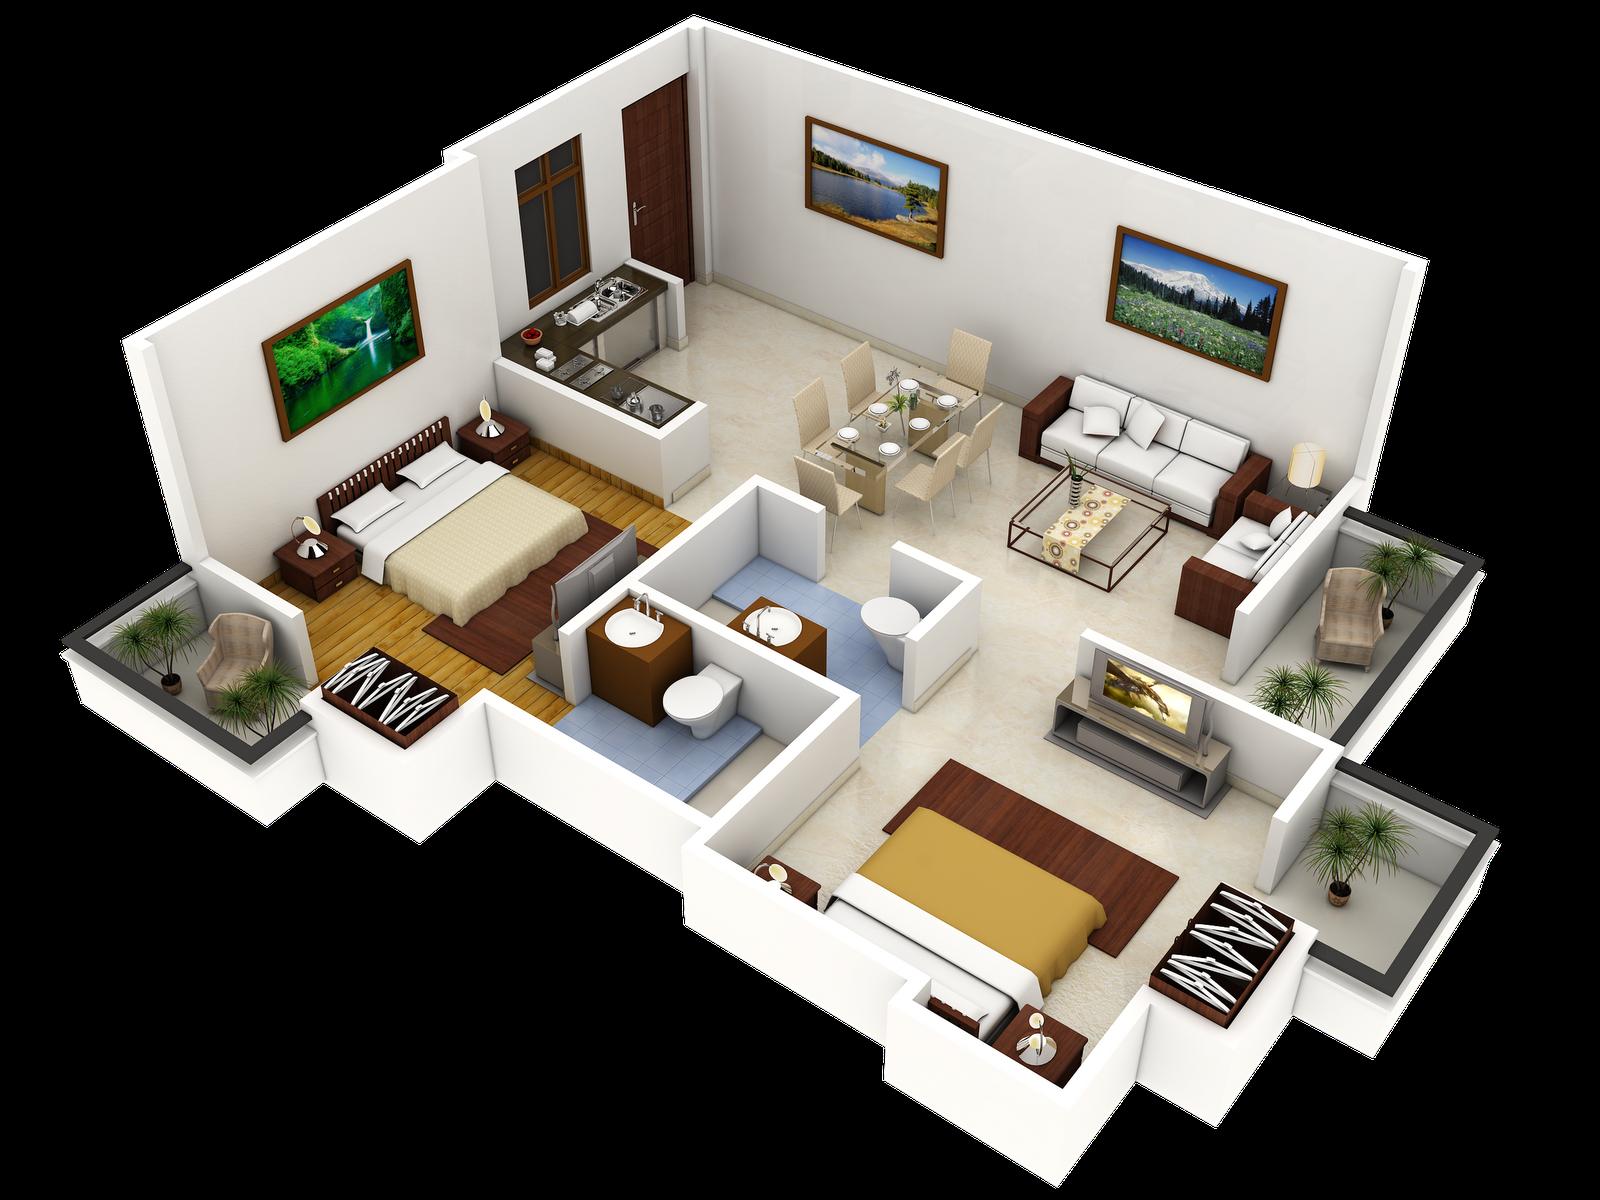 17 Best 1000 images about 3D Housing PlansLayouts on Pinterest 3d